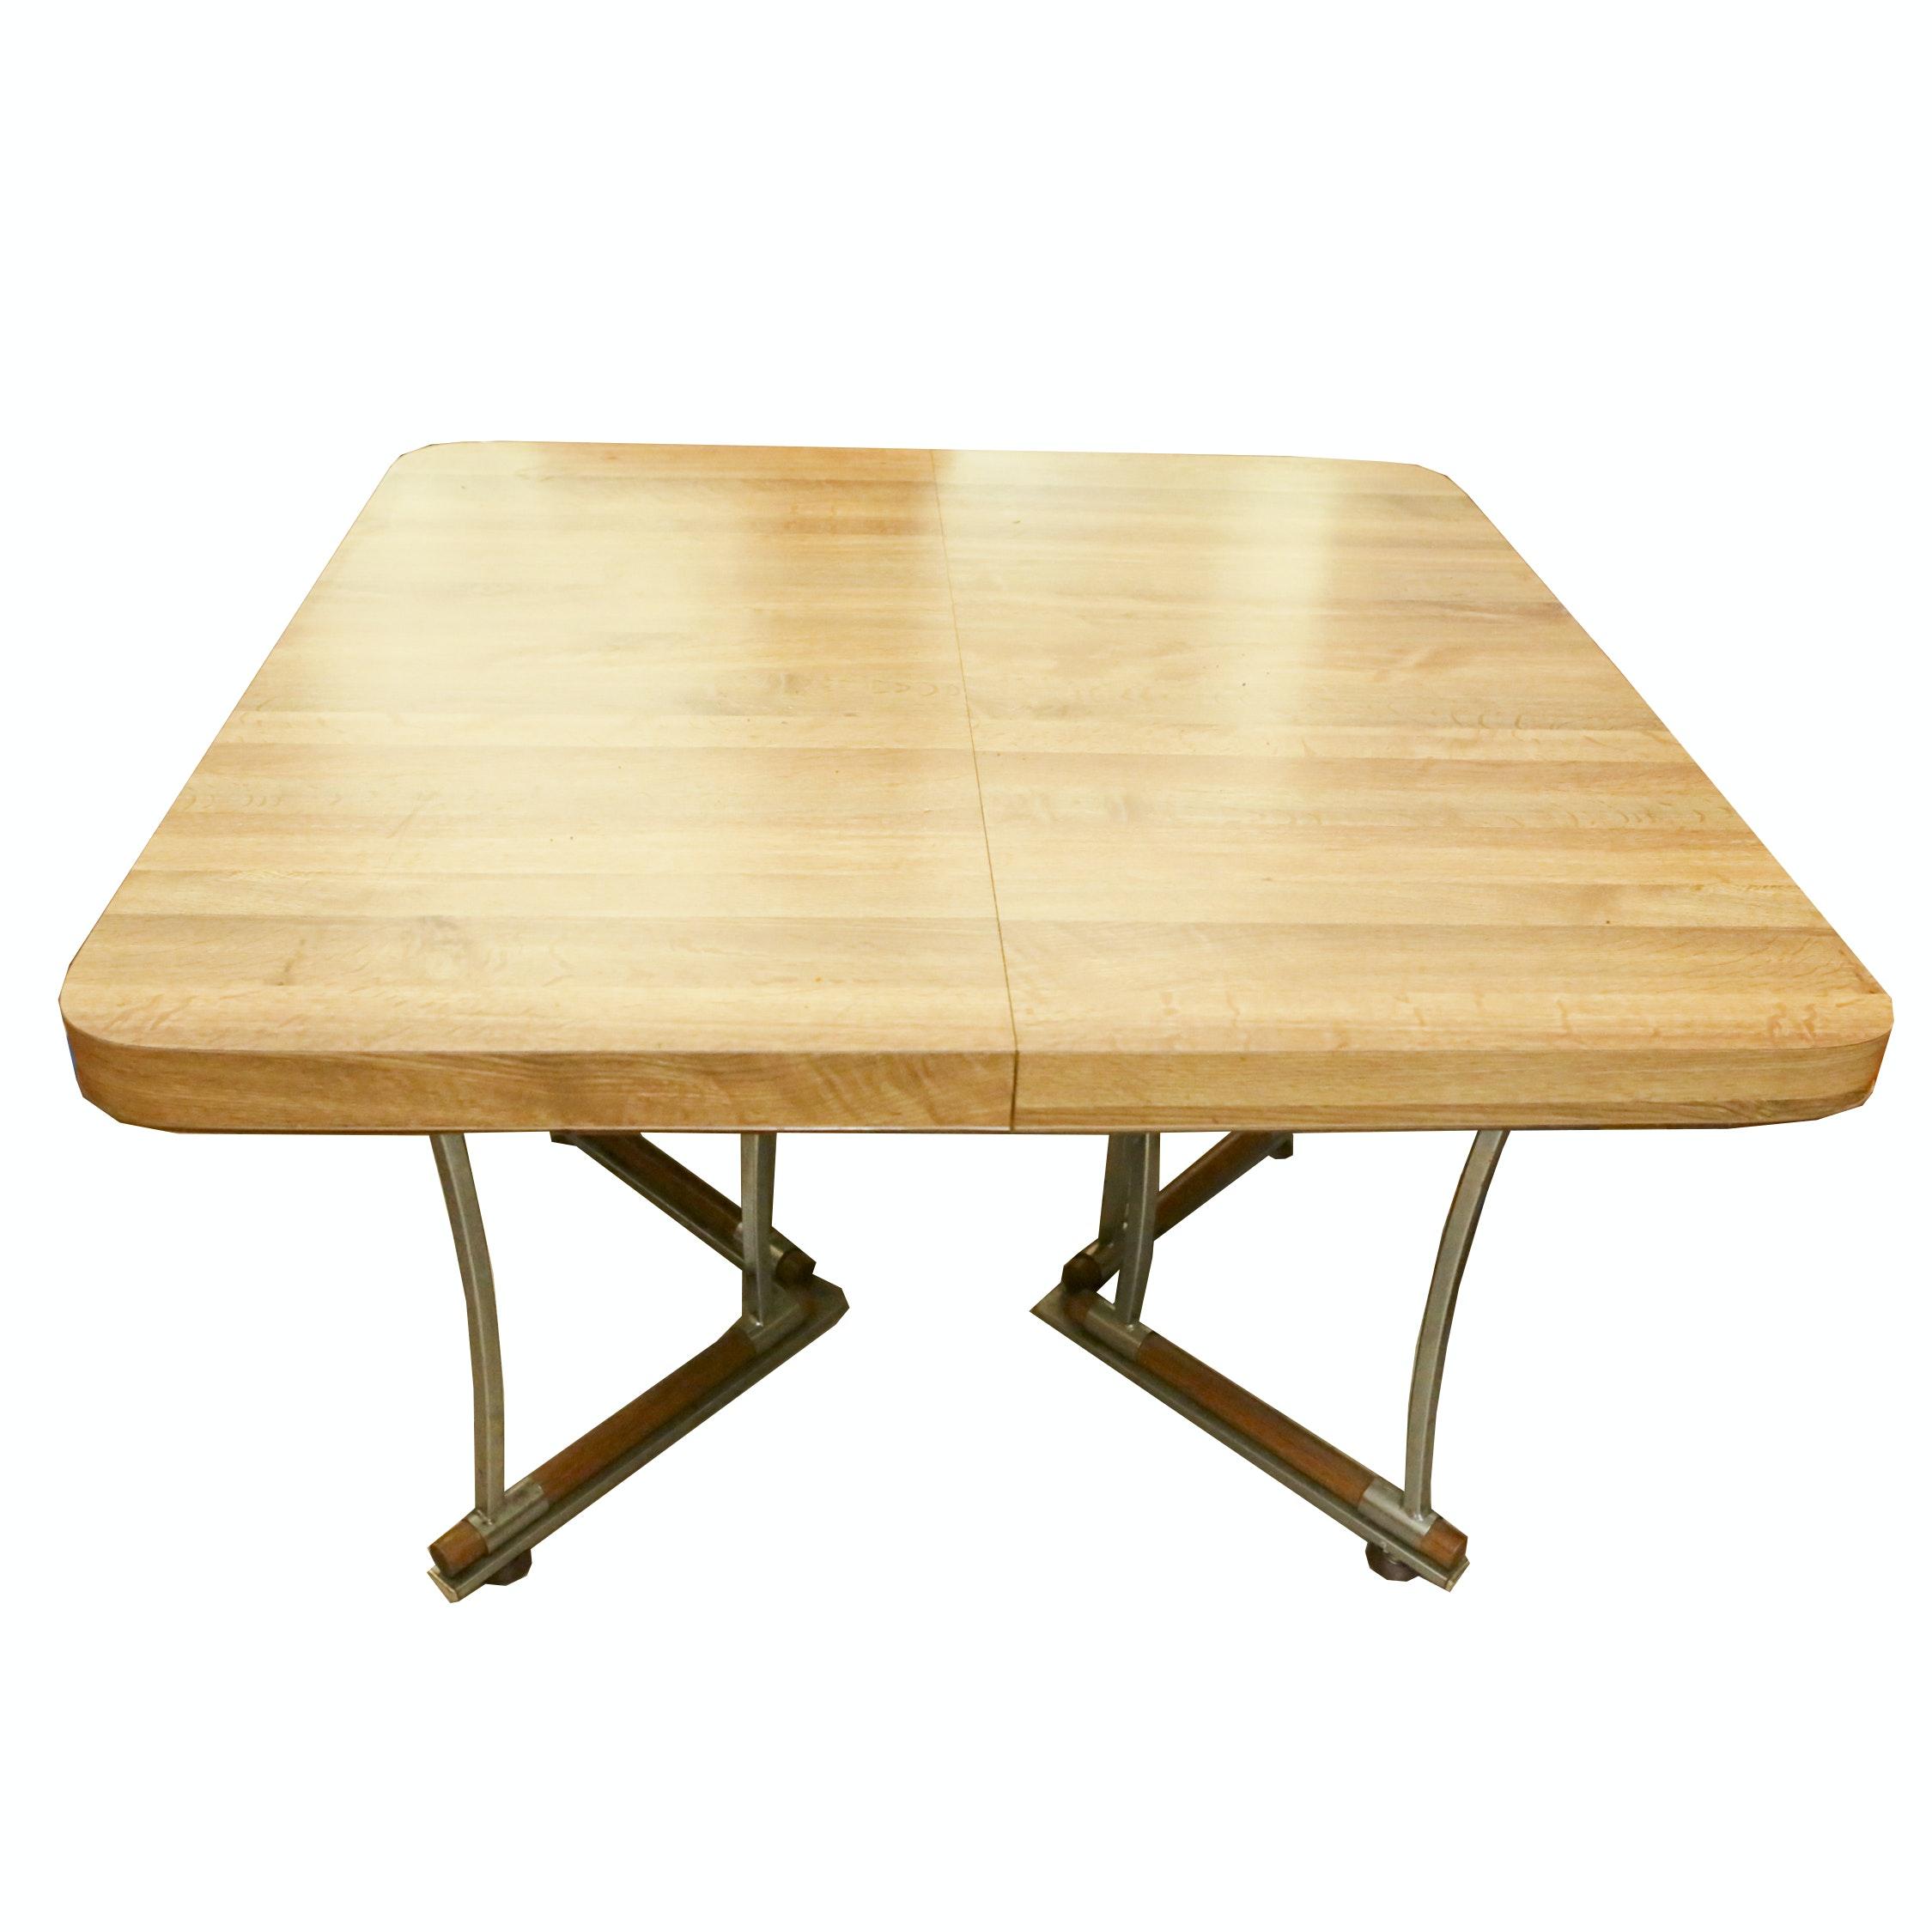 Vintage Wood Grain Laminate and Metal Dining Table